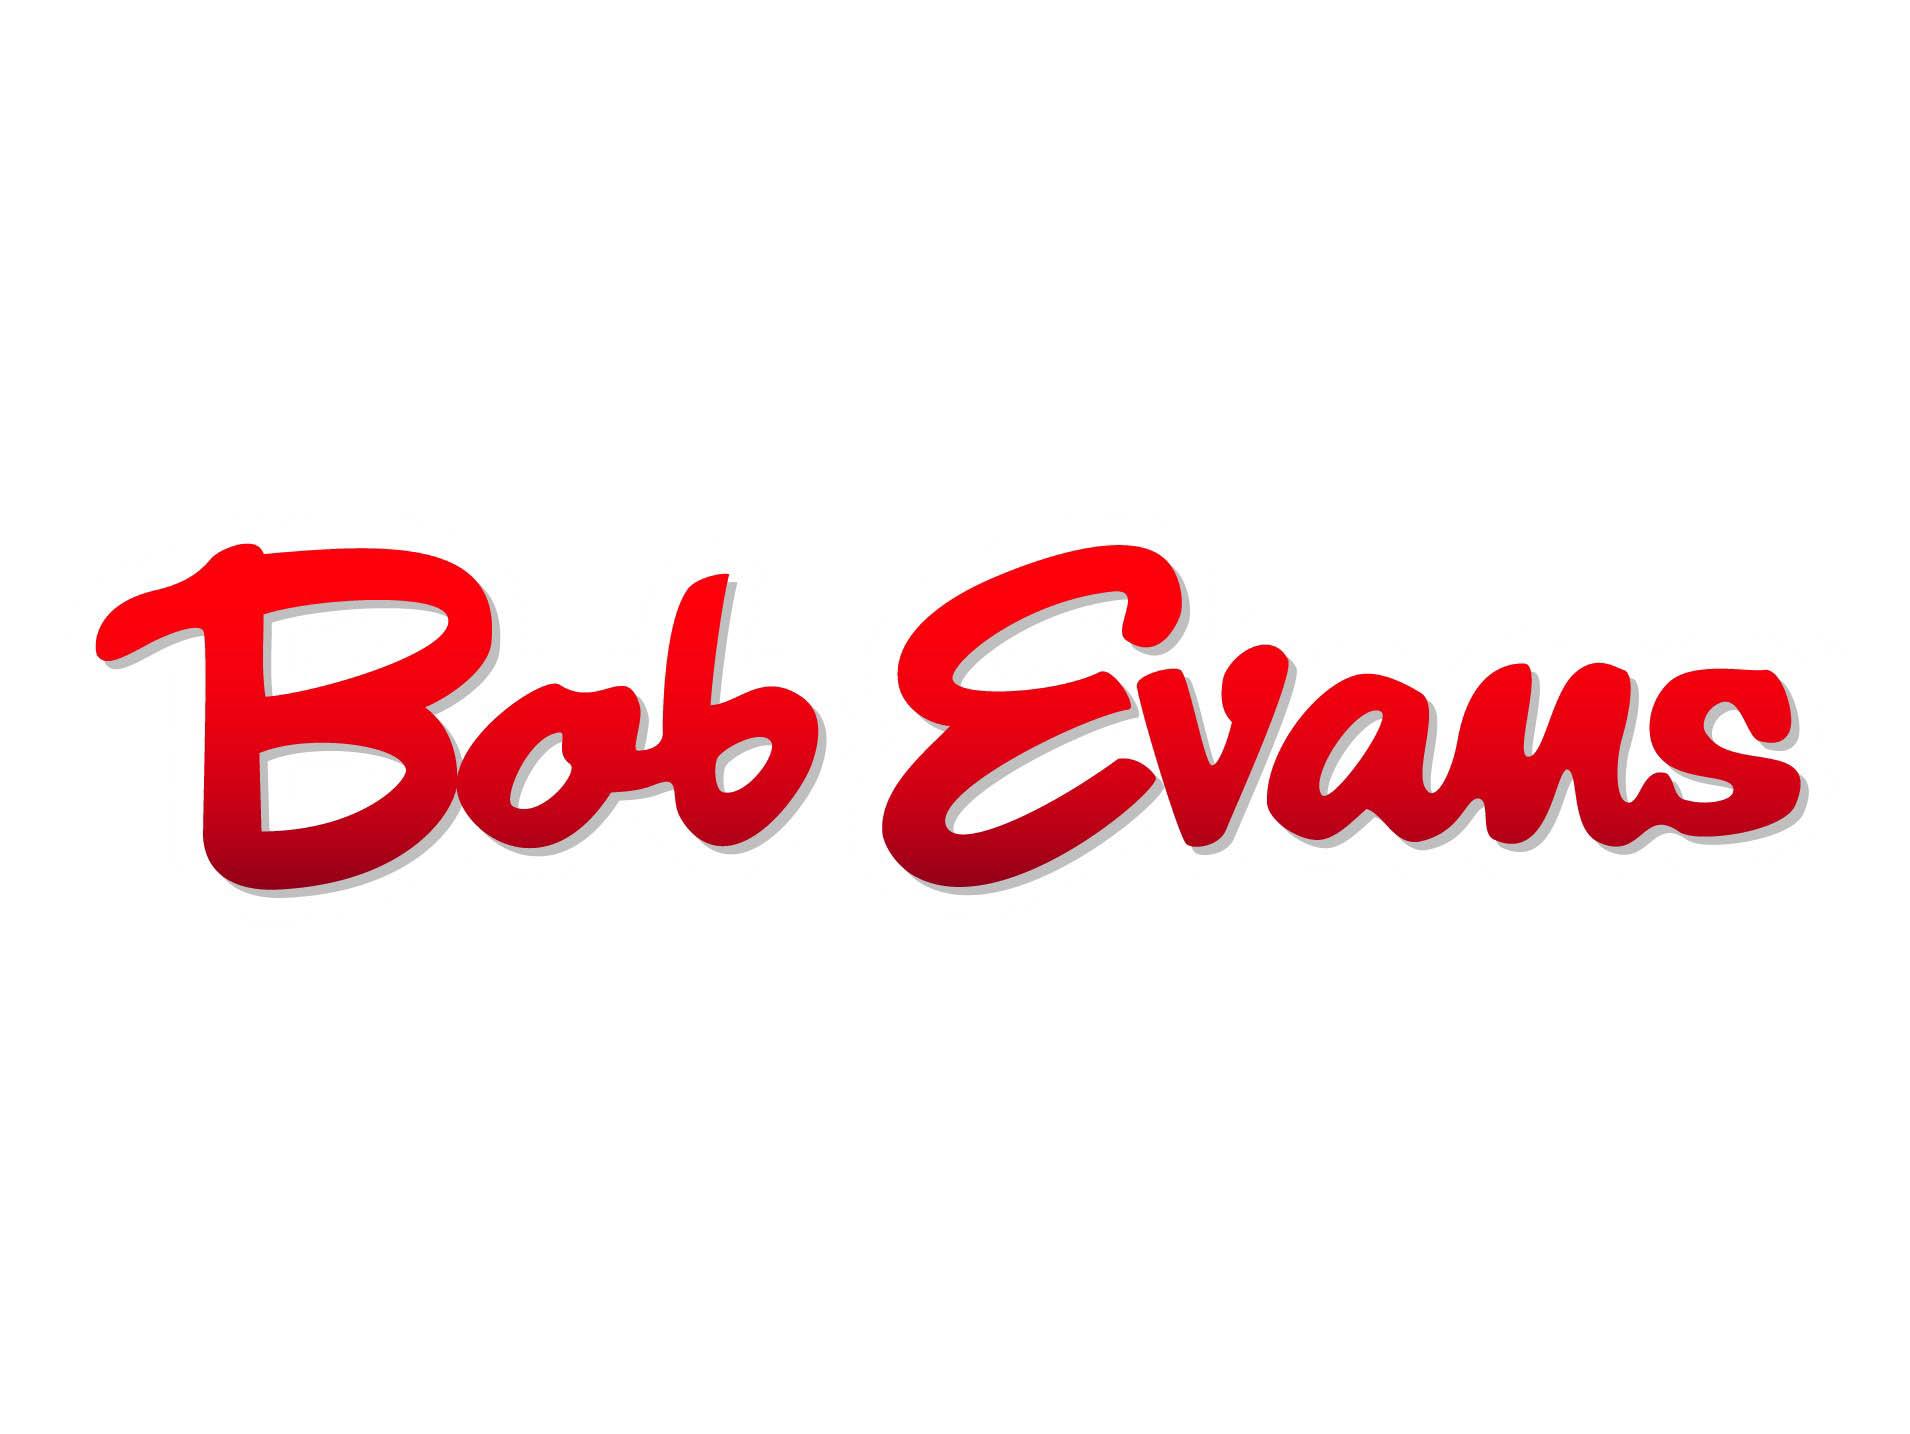 Bob Evans.jpg